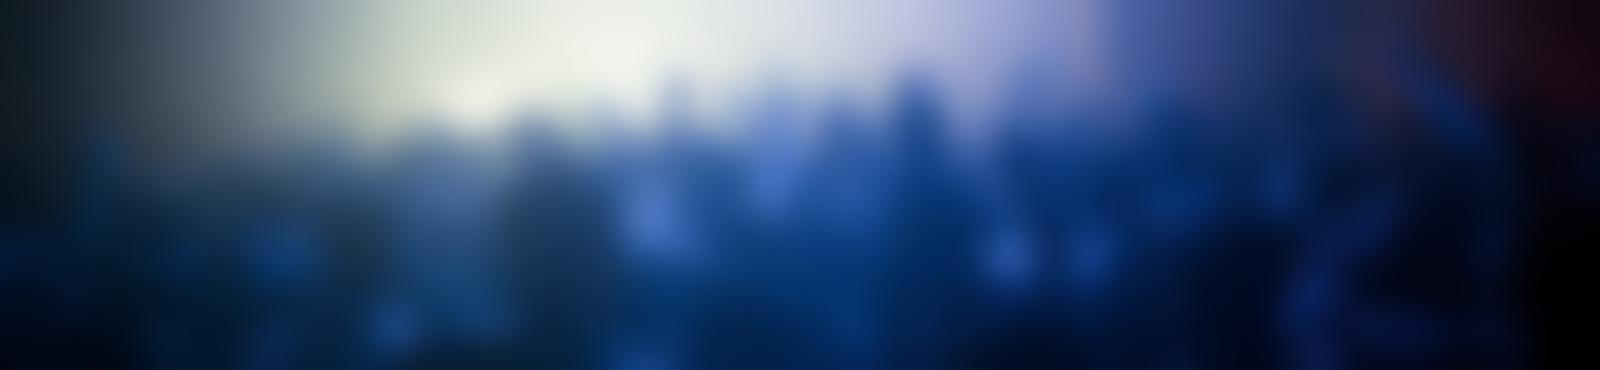 Blurred f76b00ea 9481 4f7d 97b0 5be48a4054e0